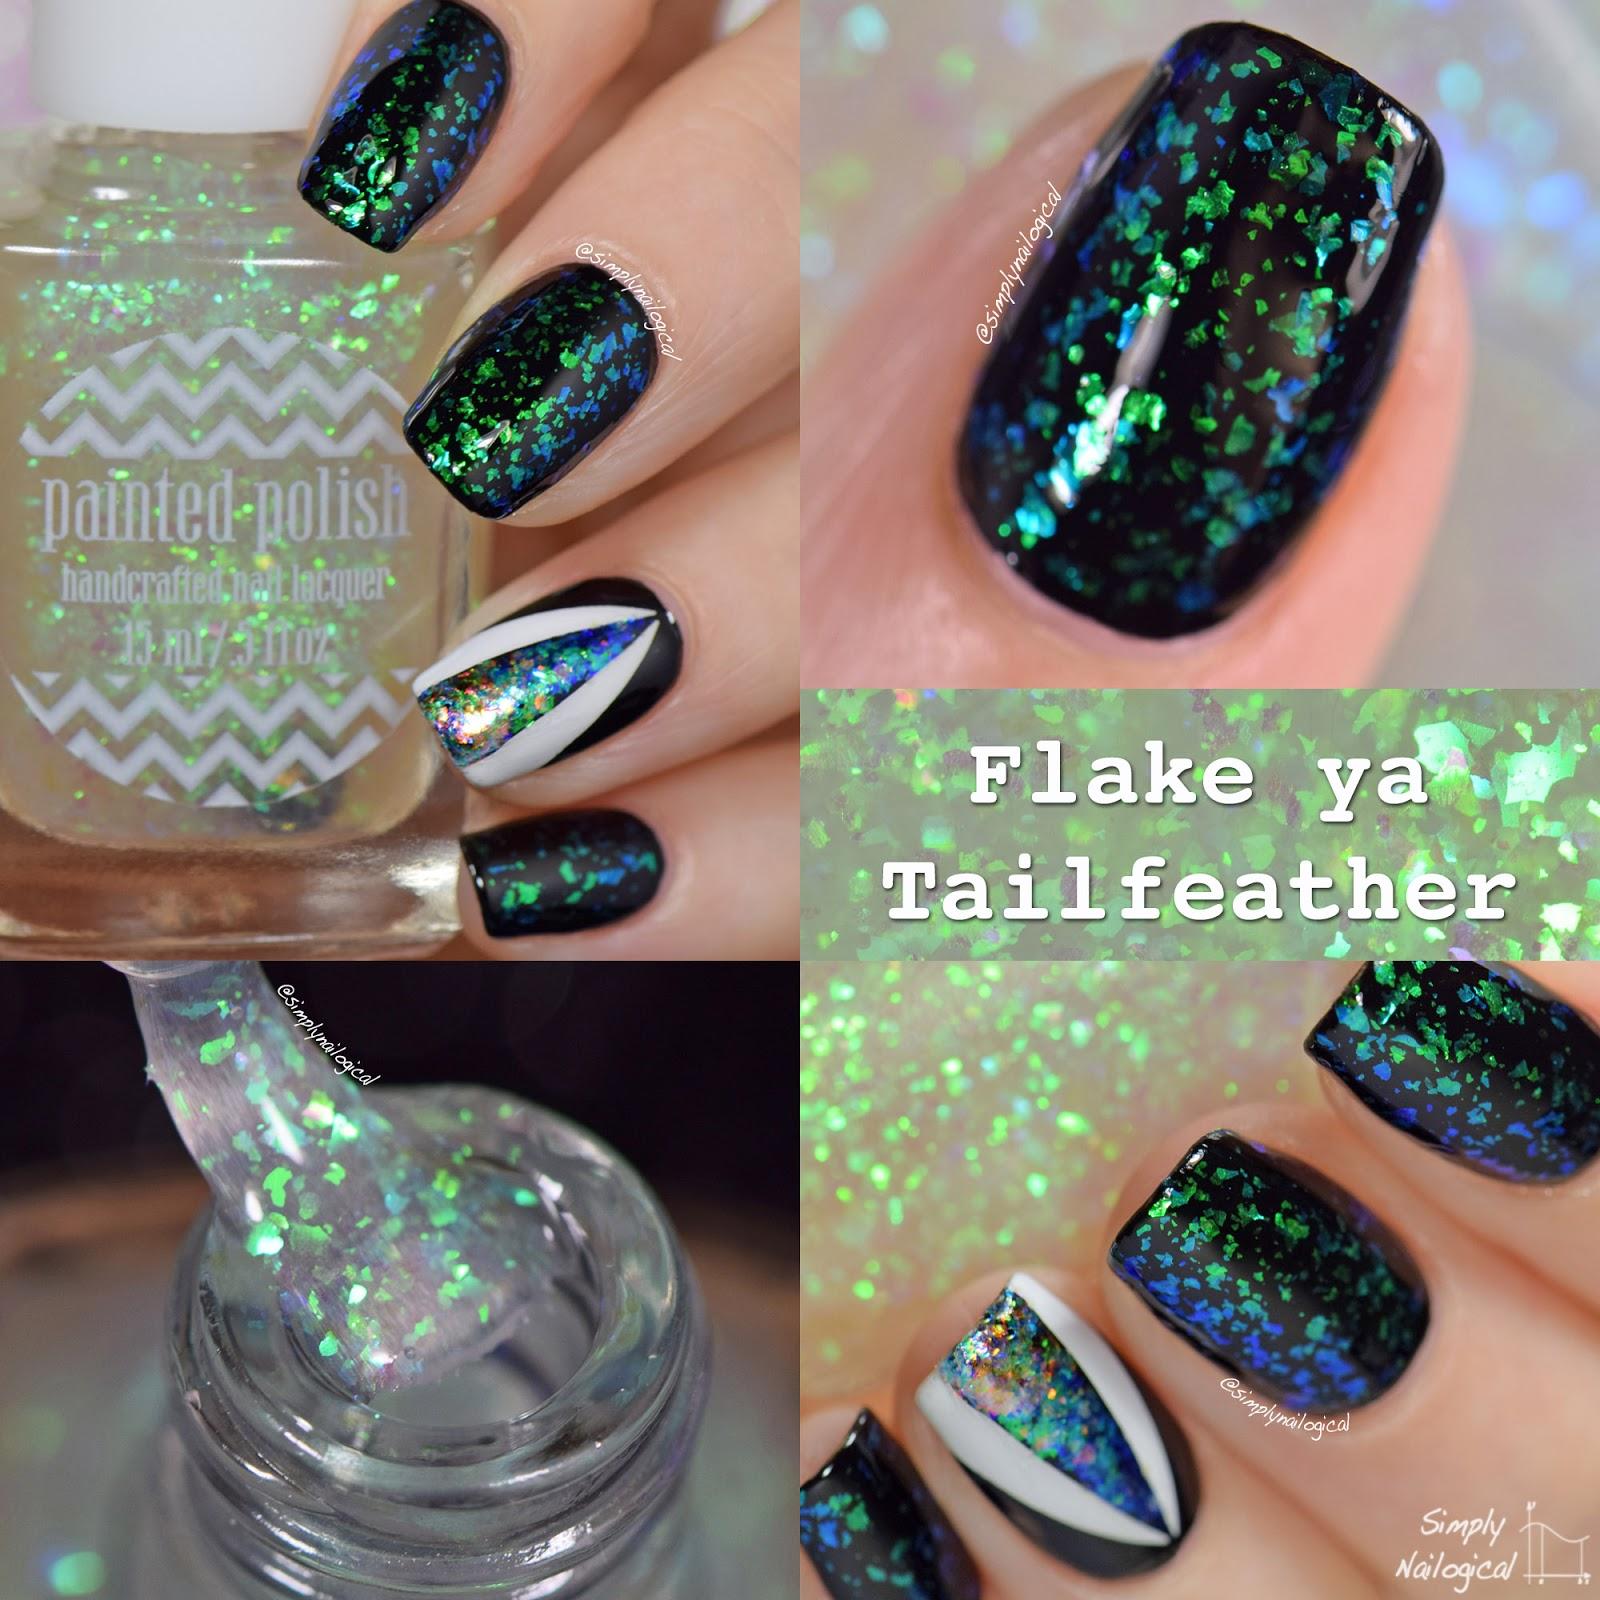 Painted Polish - Flake Ya Tailfeather